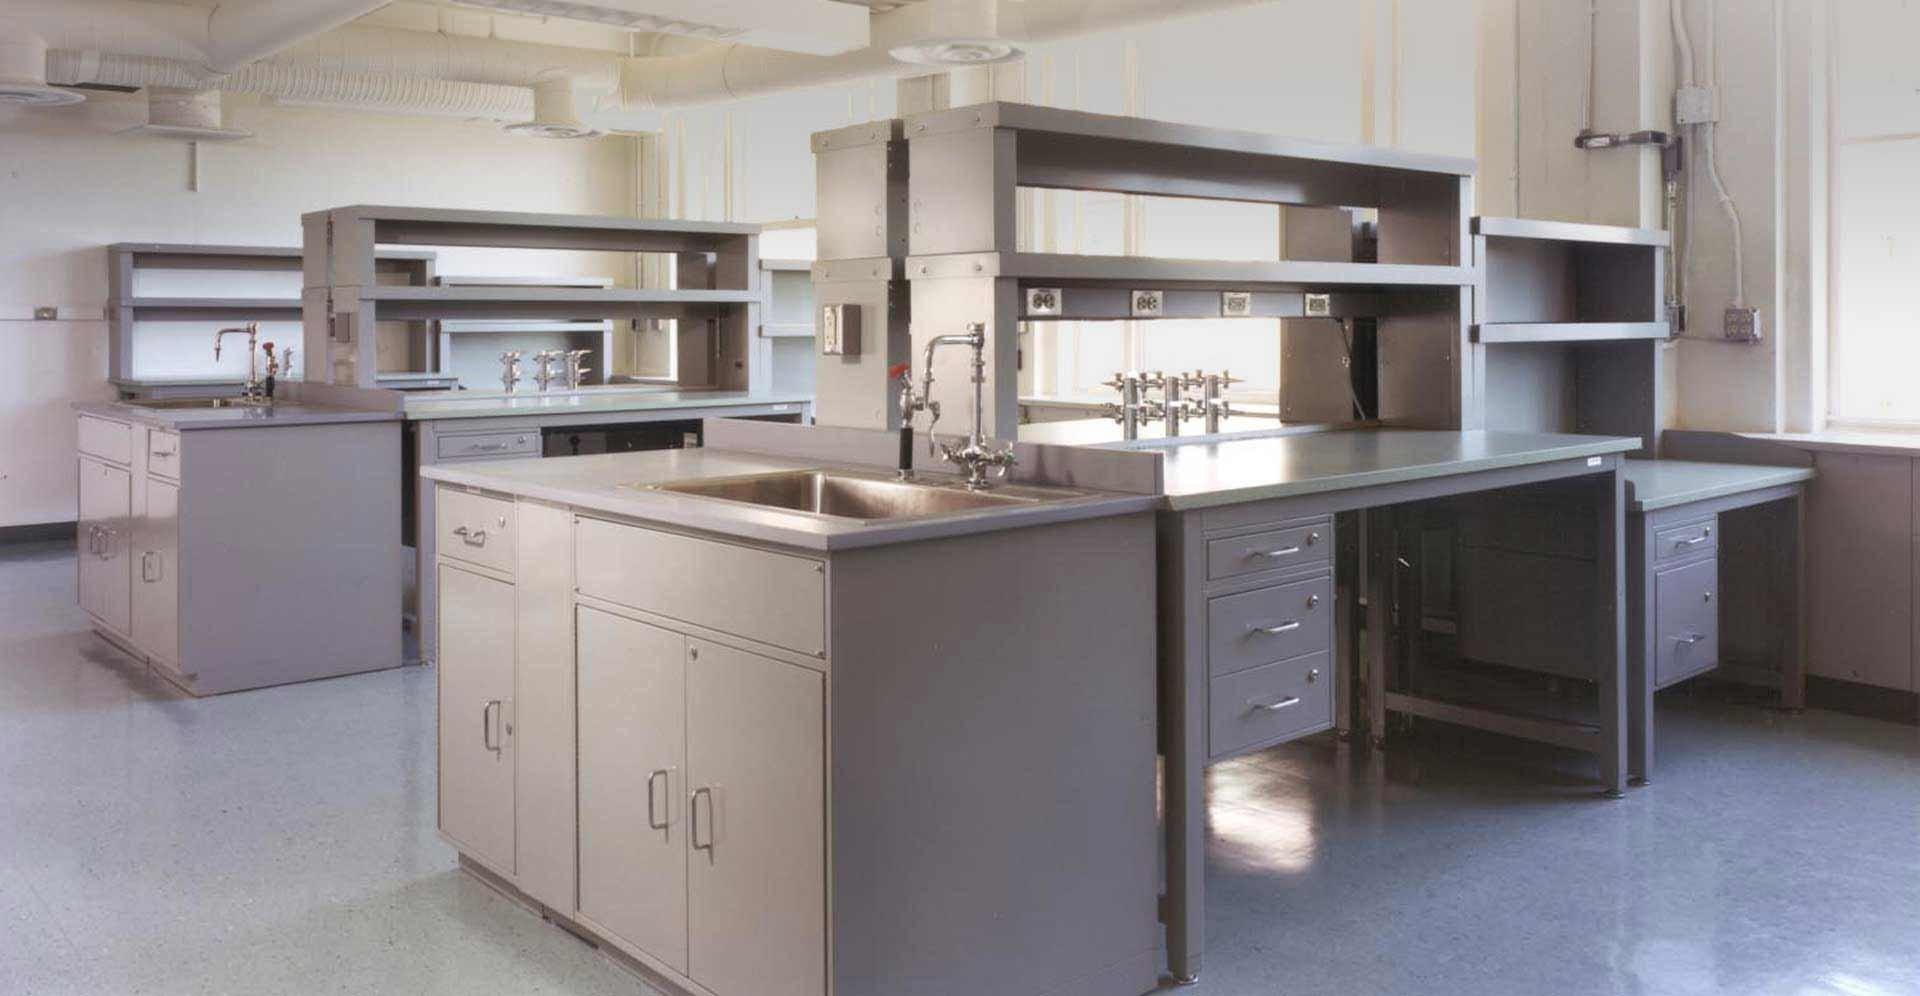 Yale Laboratory for Medicine and Pediatrics (LMP)